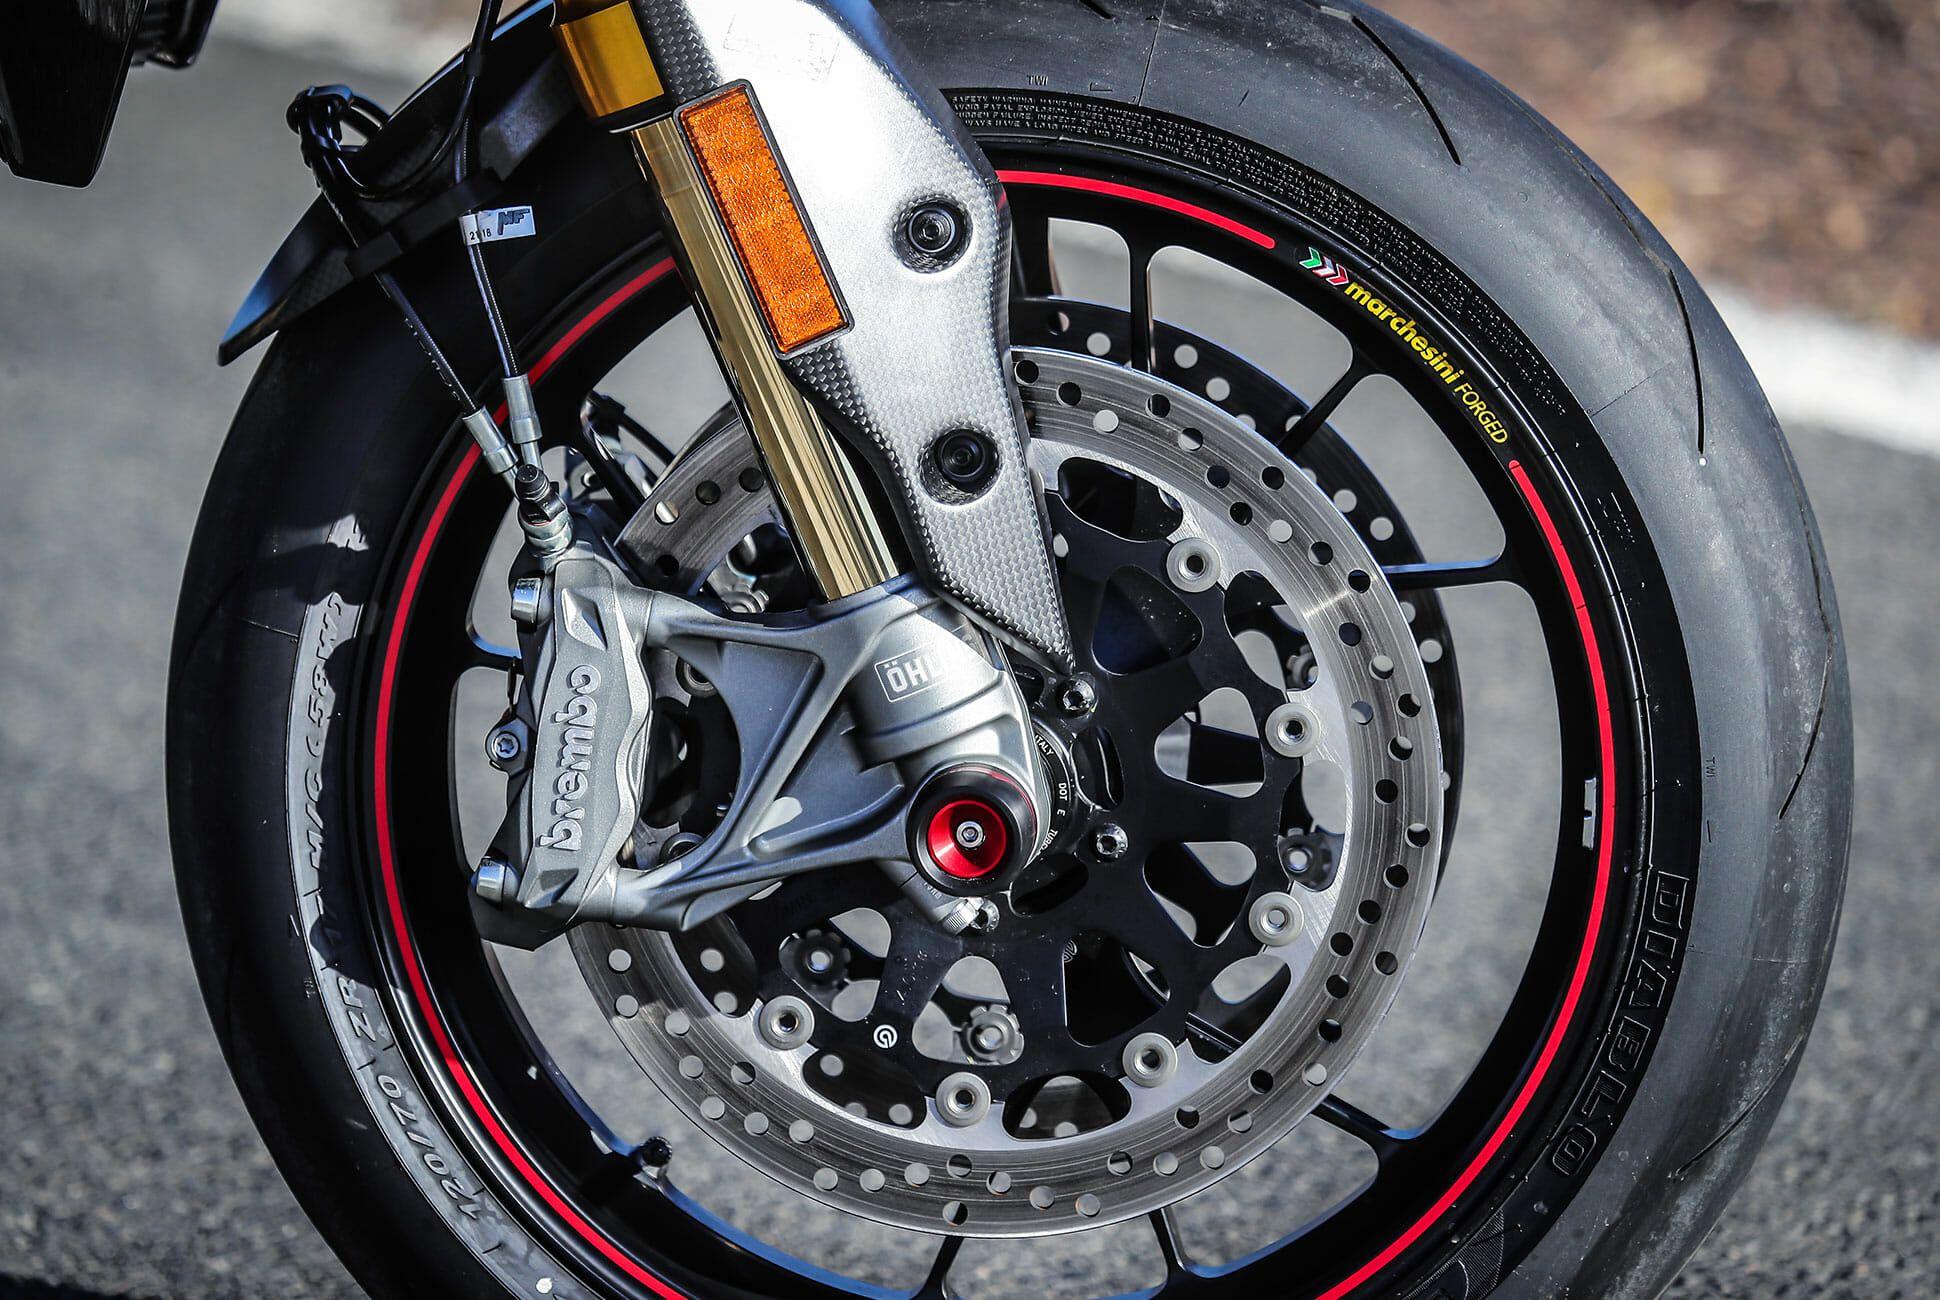 Ducati-Hypermotard-950-SP-Review-gear-patrol-slide-7